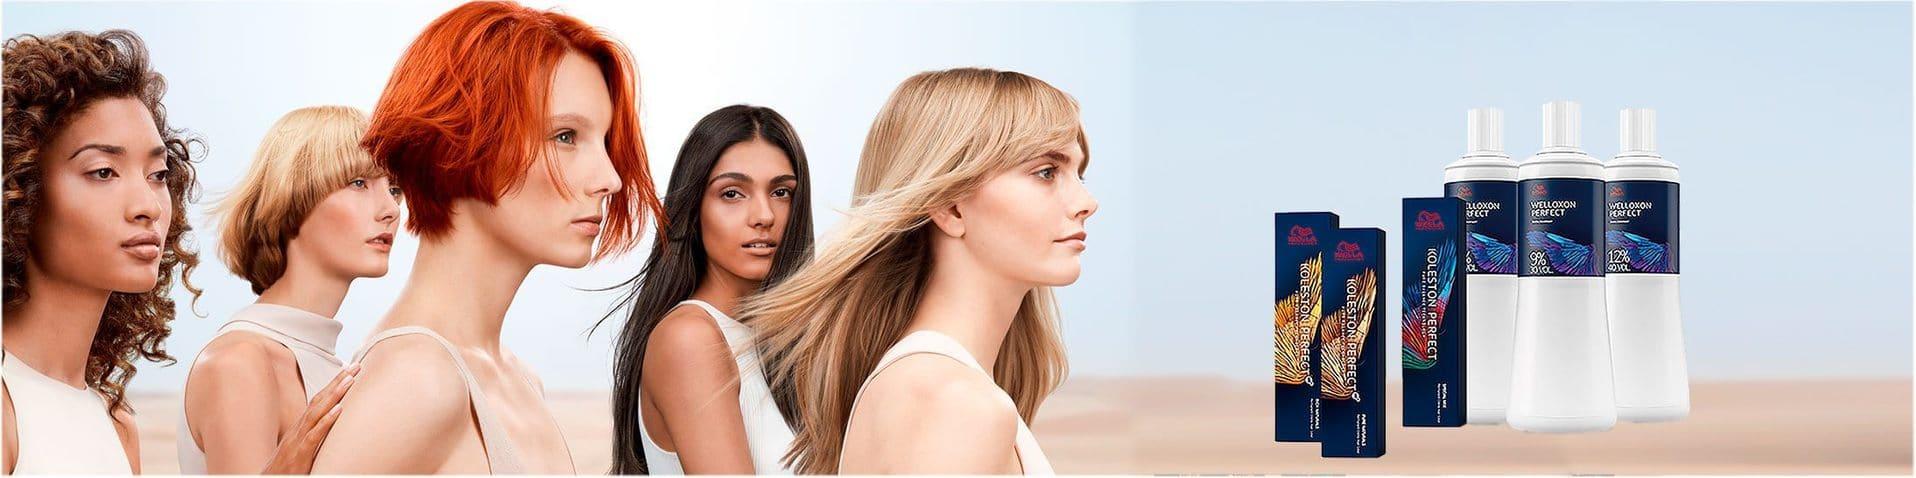 Wella Koleston Perfect Окрашивание волос